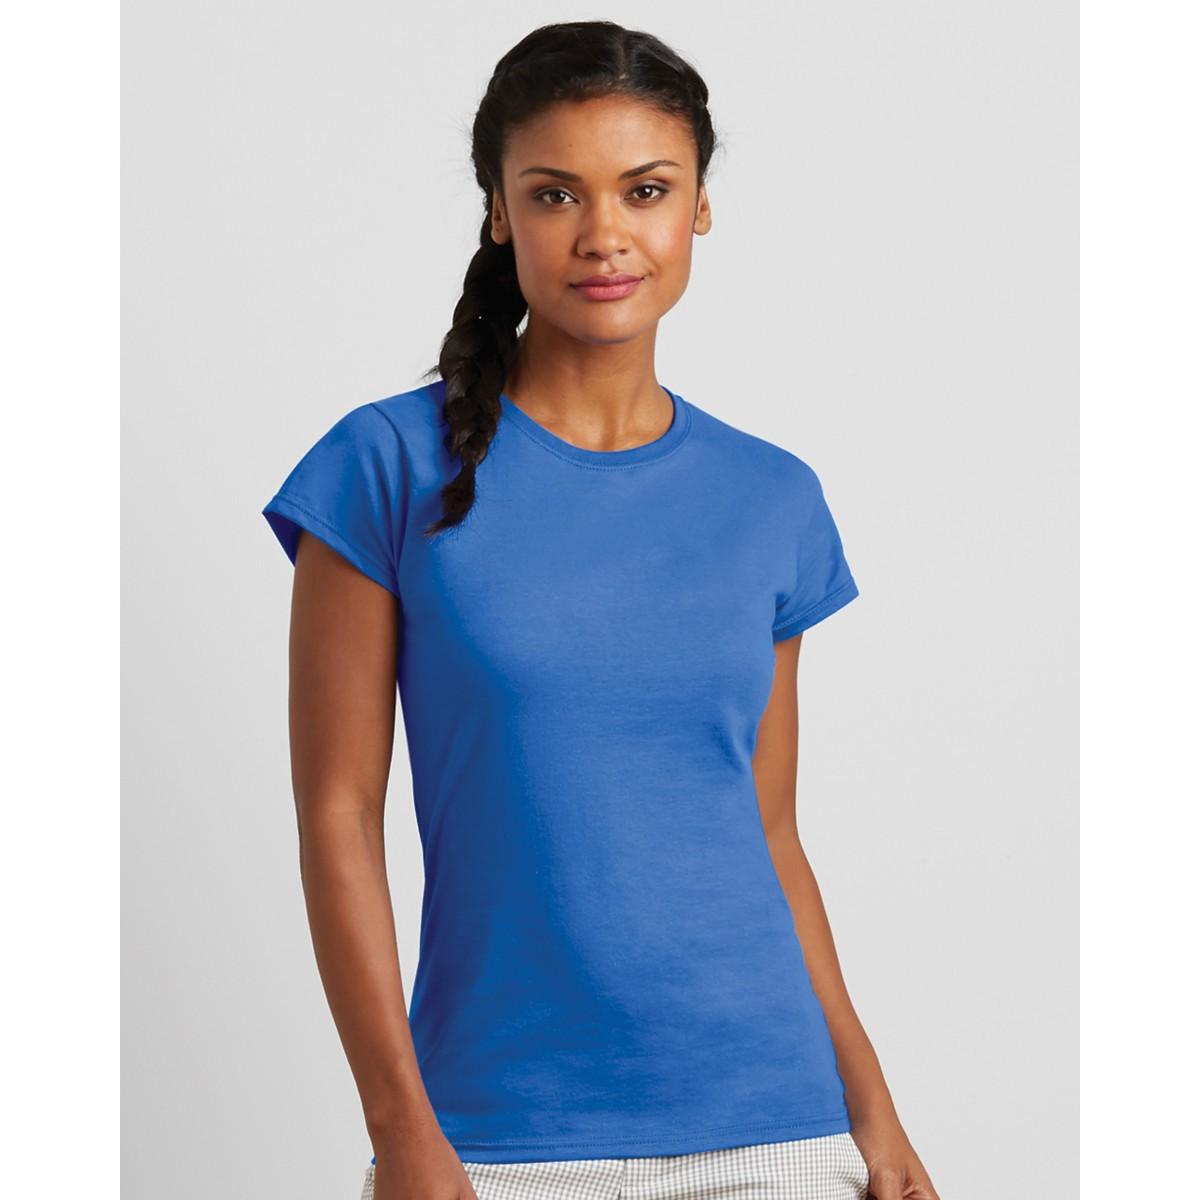 Ladies t shirt printing